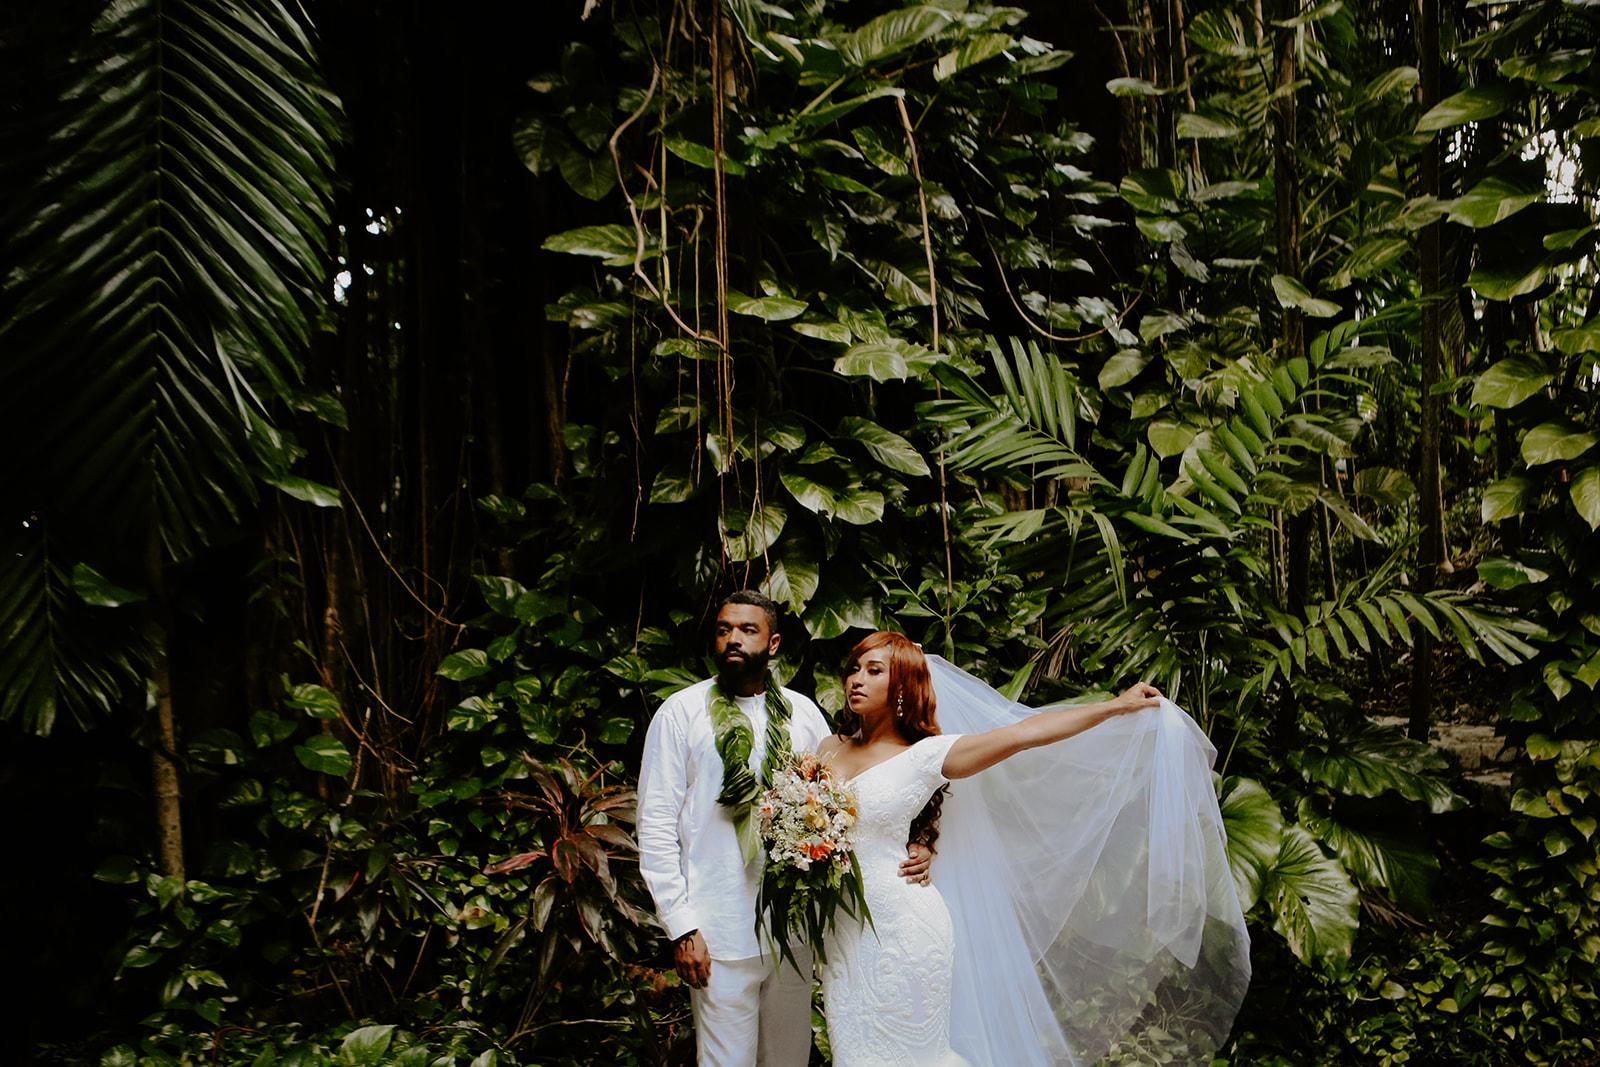 desiree & ron - JAMAICA WEDDING